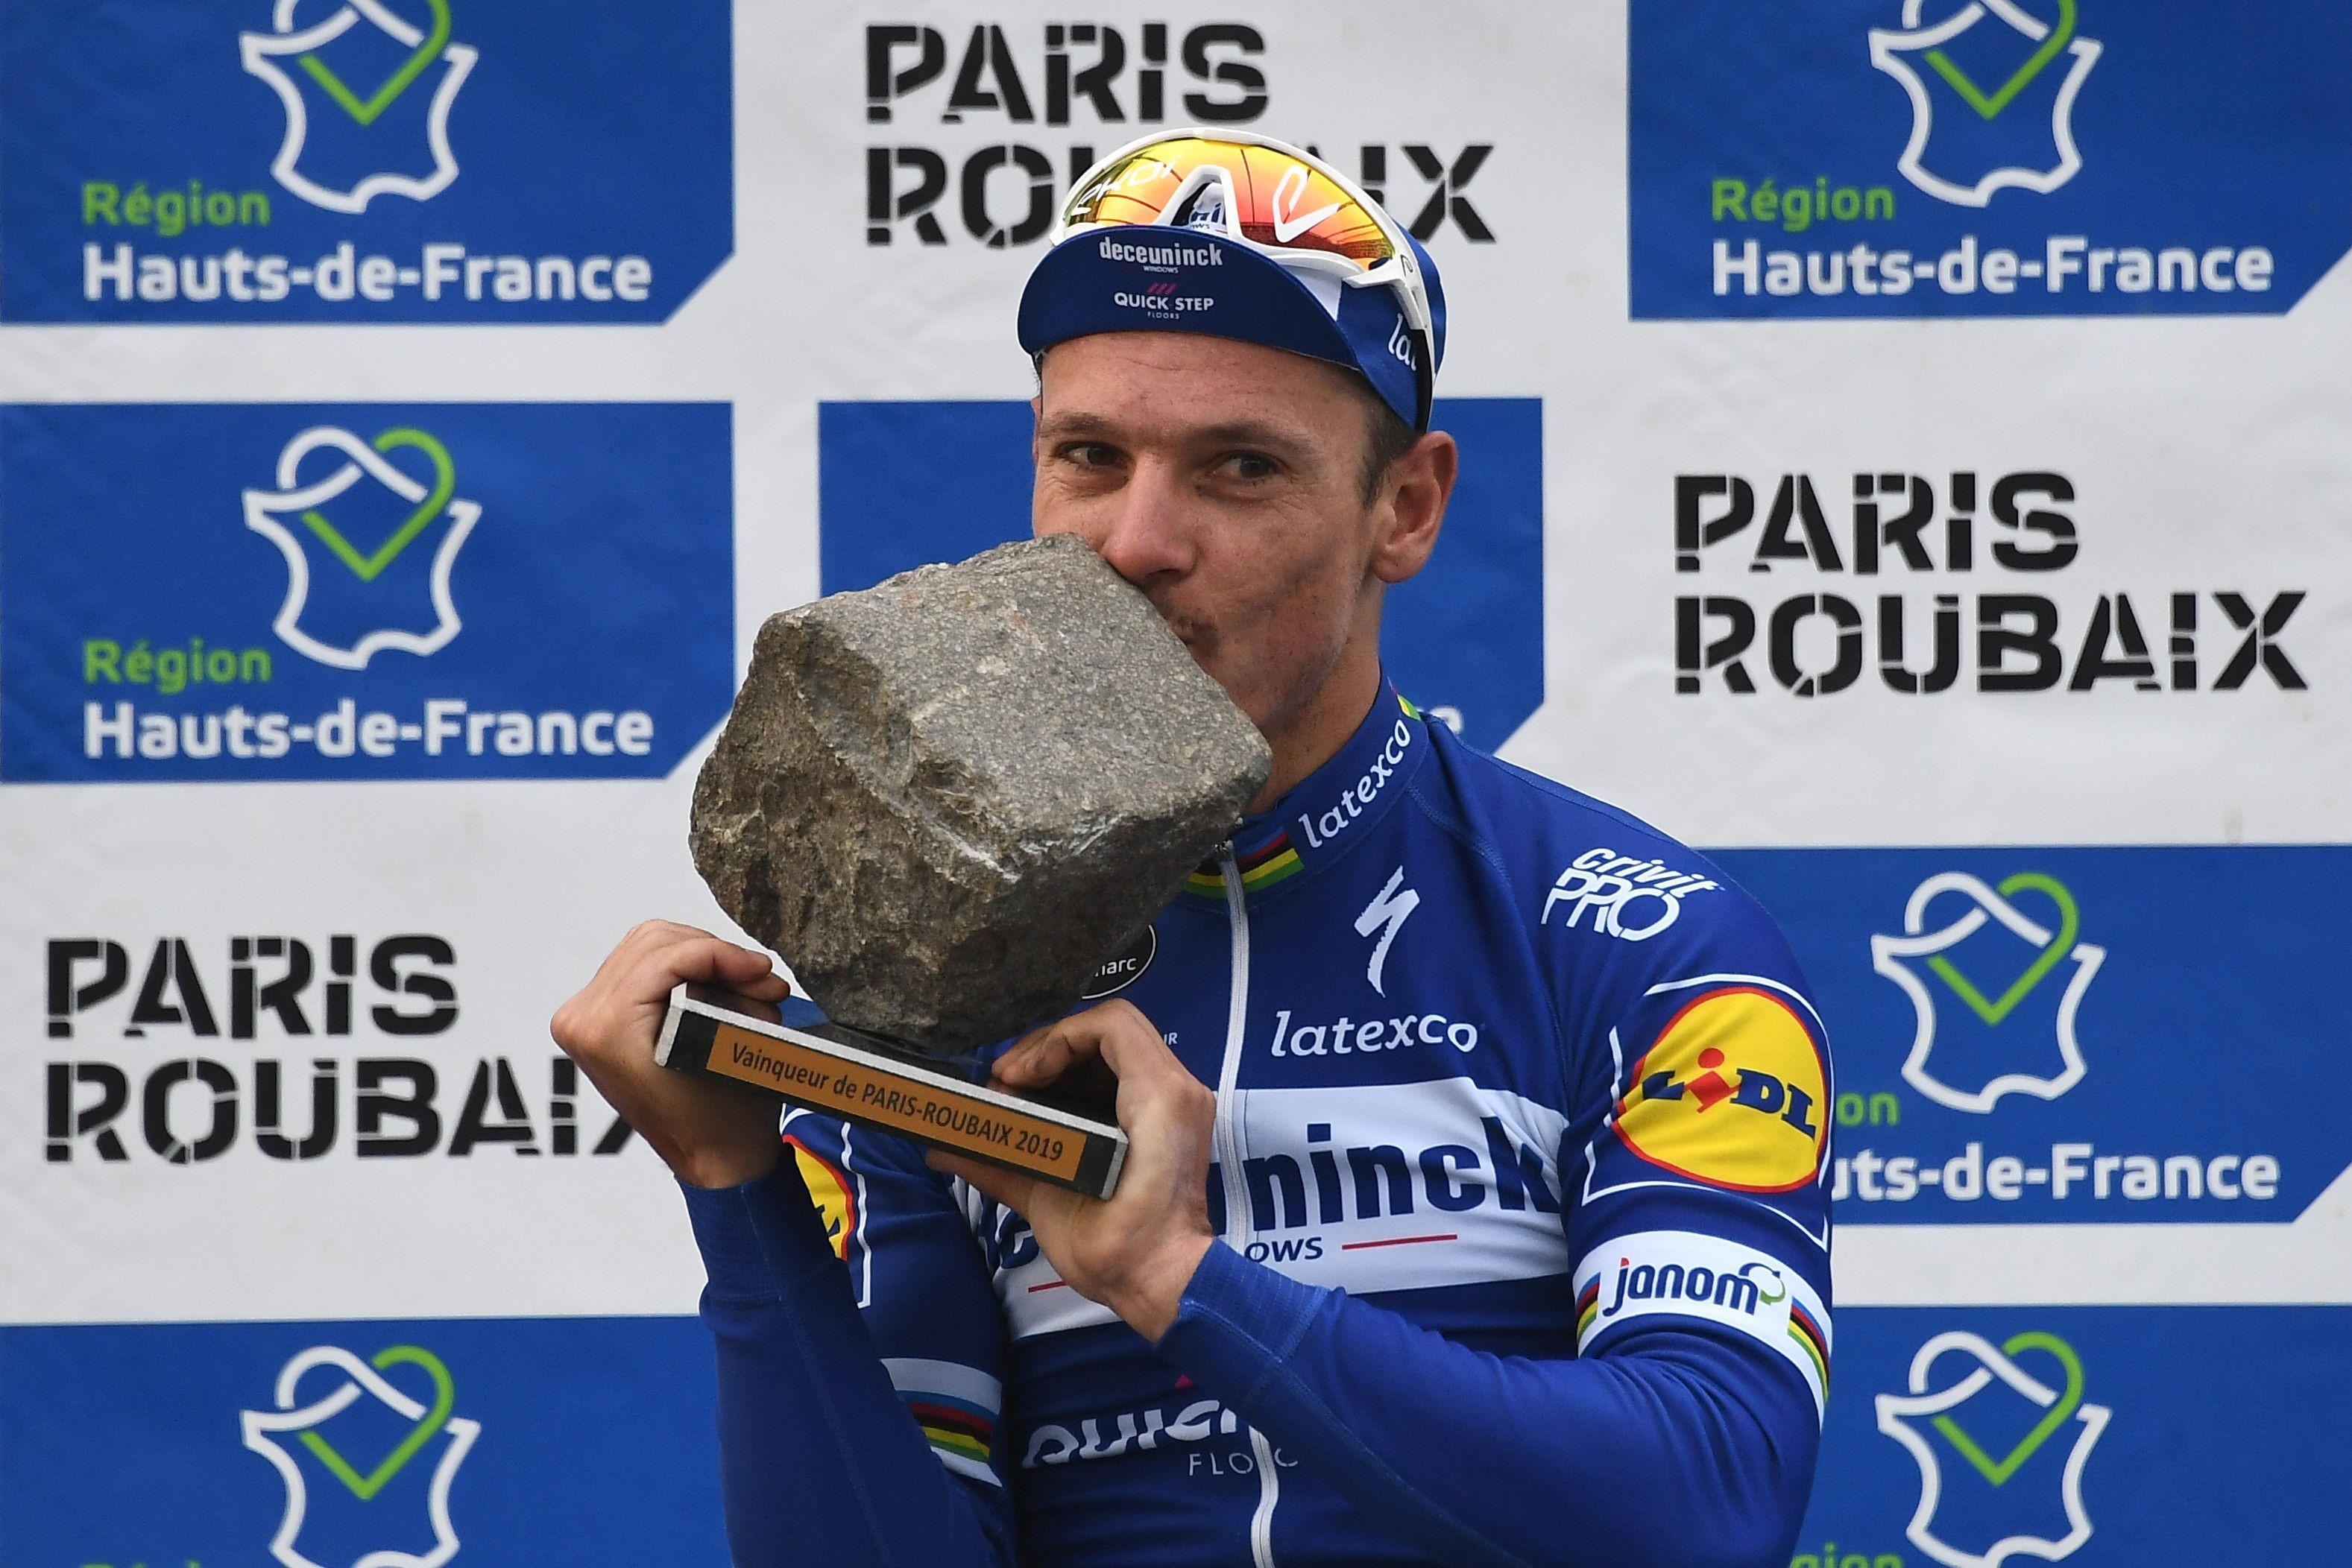 Philippe Gilbert, París-Roubaix